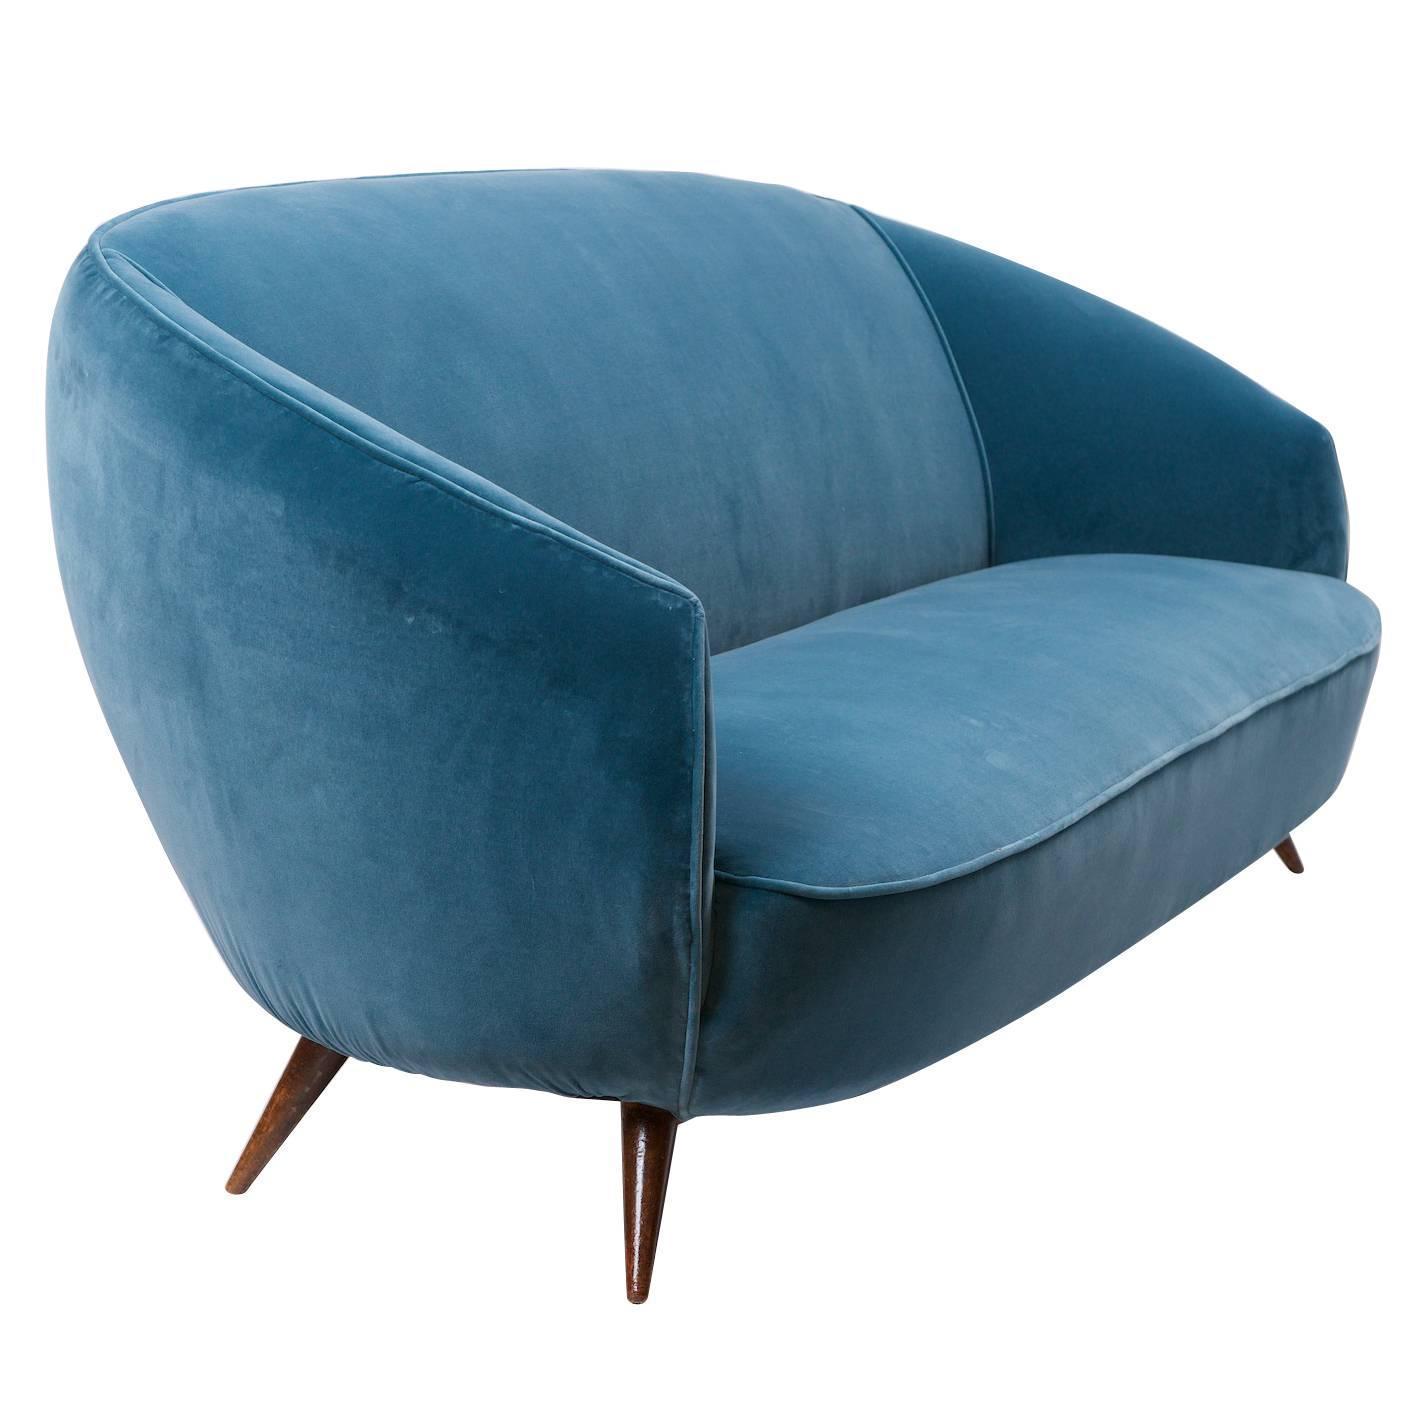 sofa ball stopper circe clei prezzo ico parisi style circa 1950 at 1stdibs